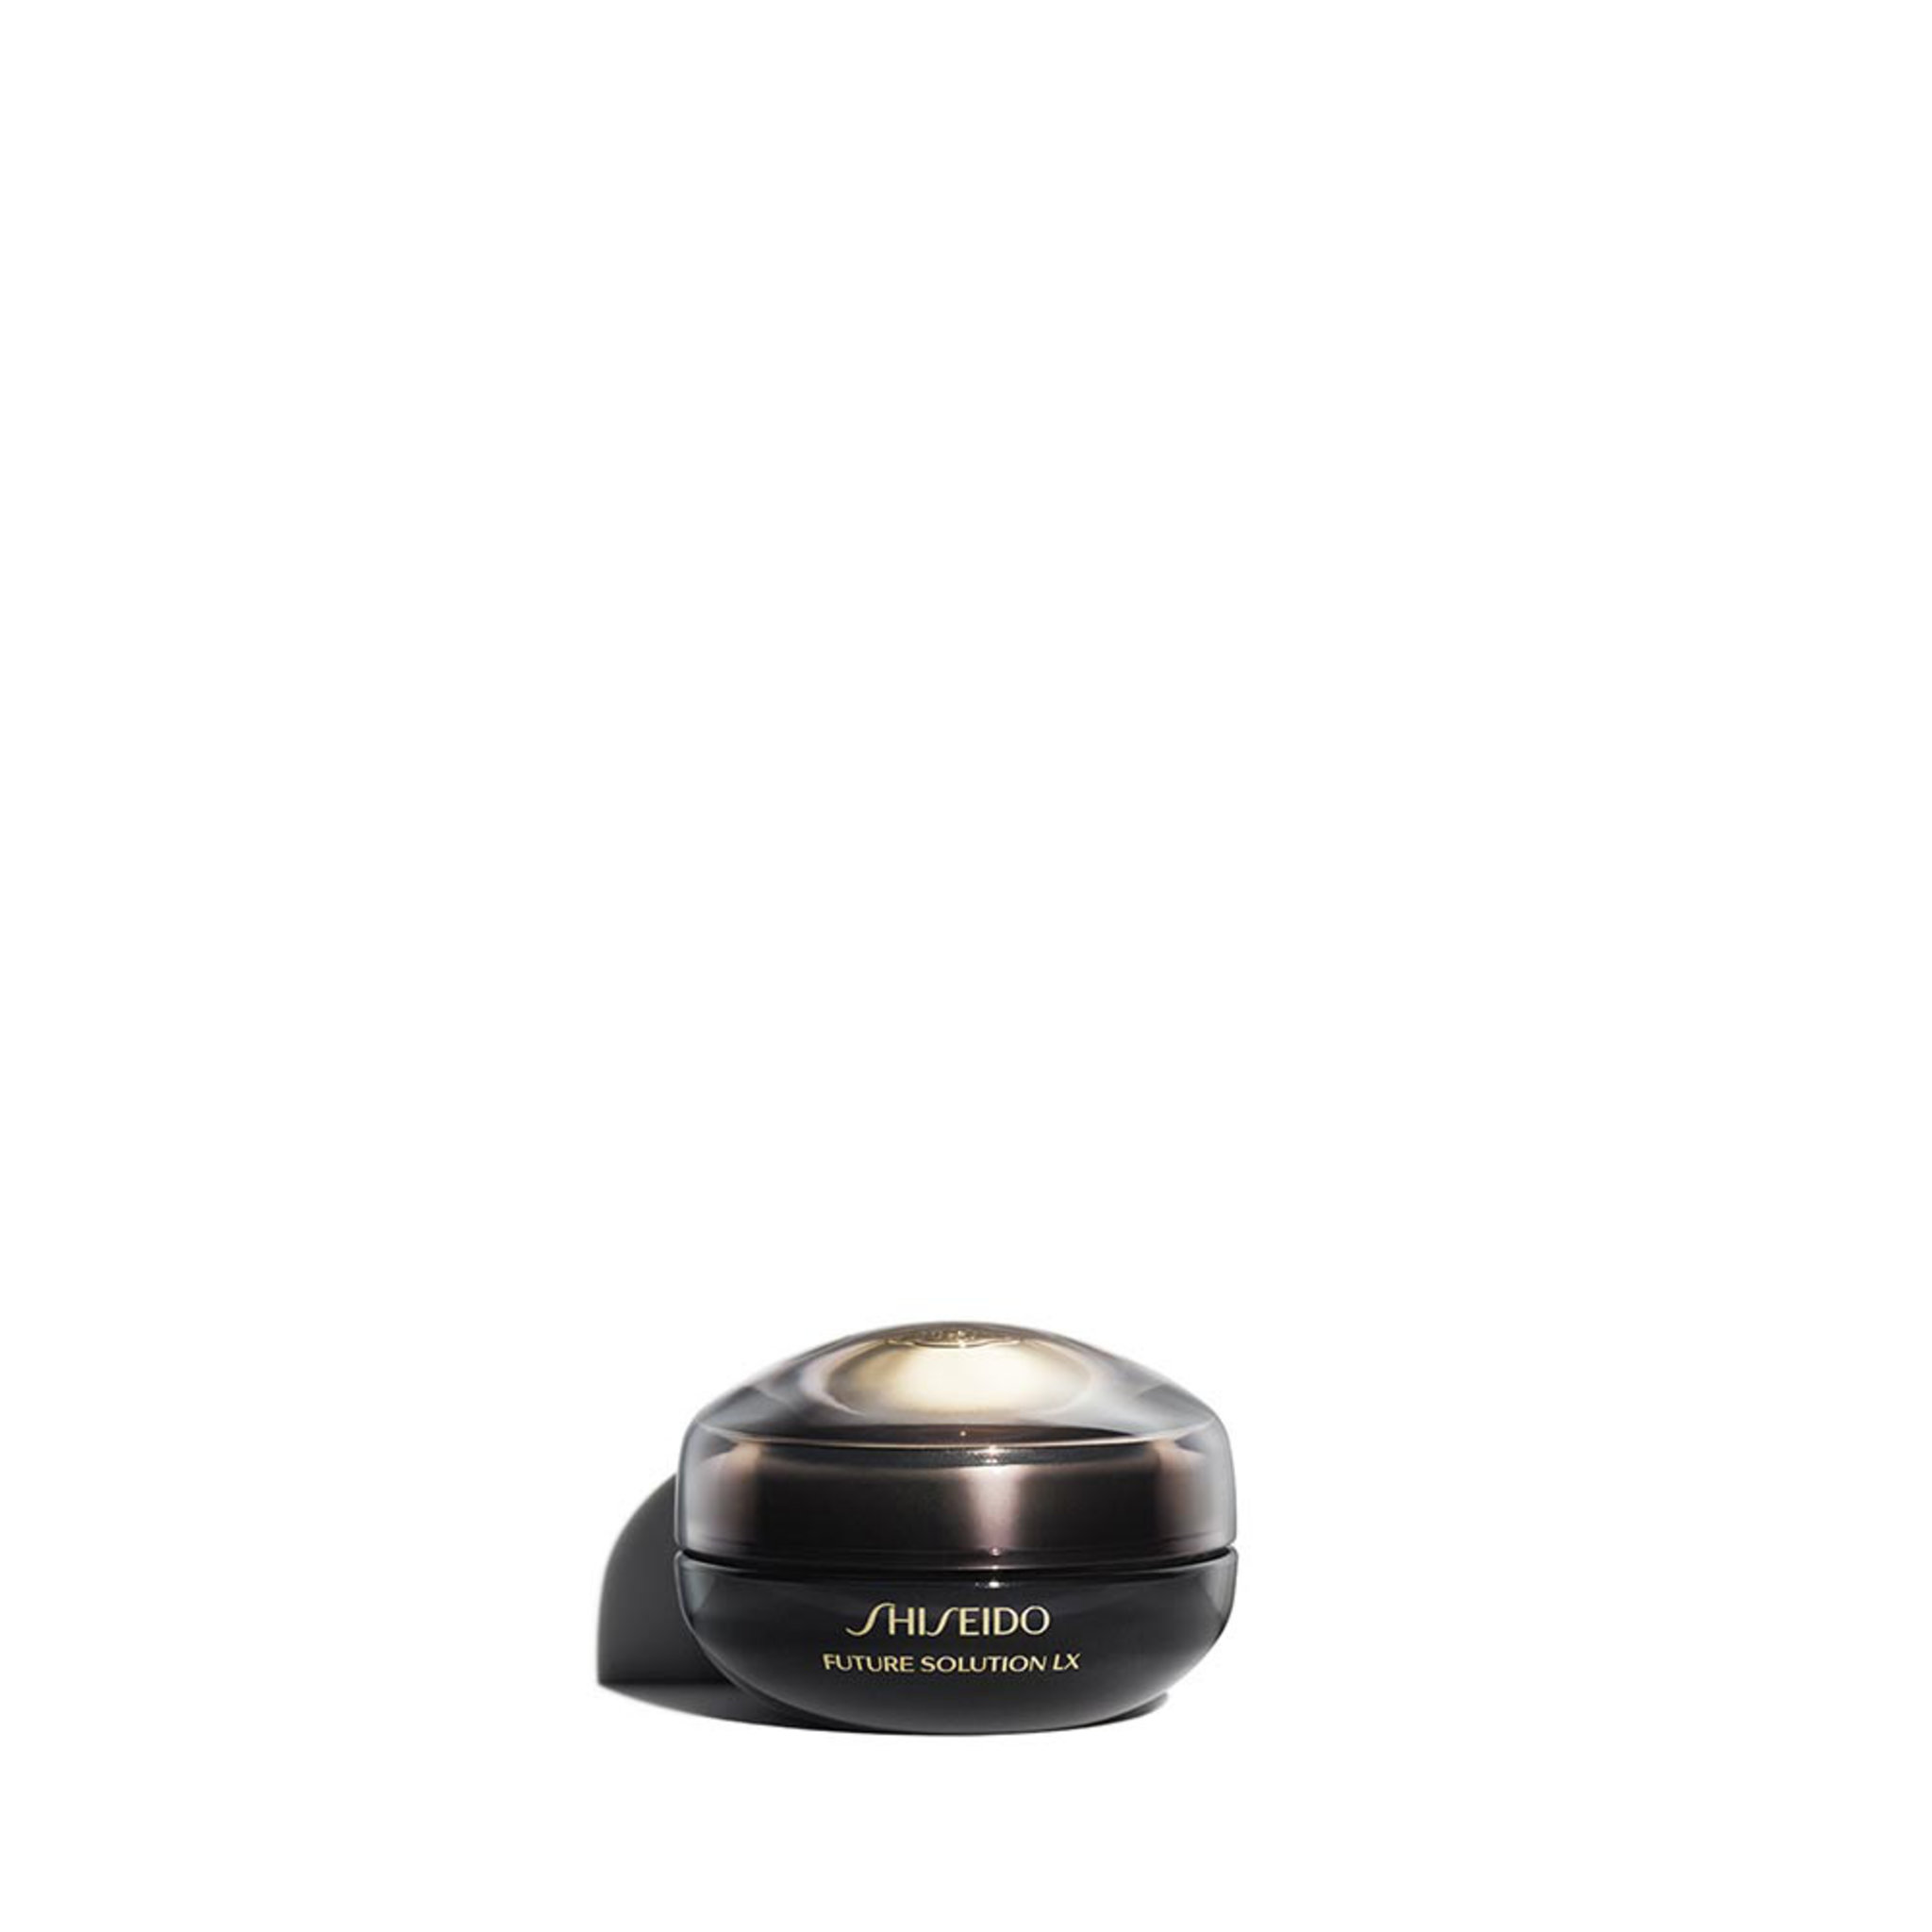 Future Solution Lx Eye And Lip Contour Regenerating Cream, 15 ml